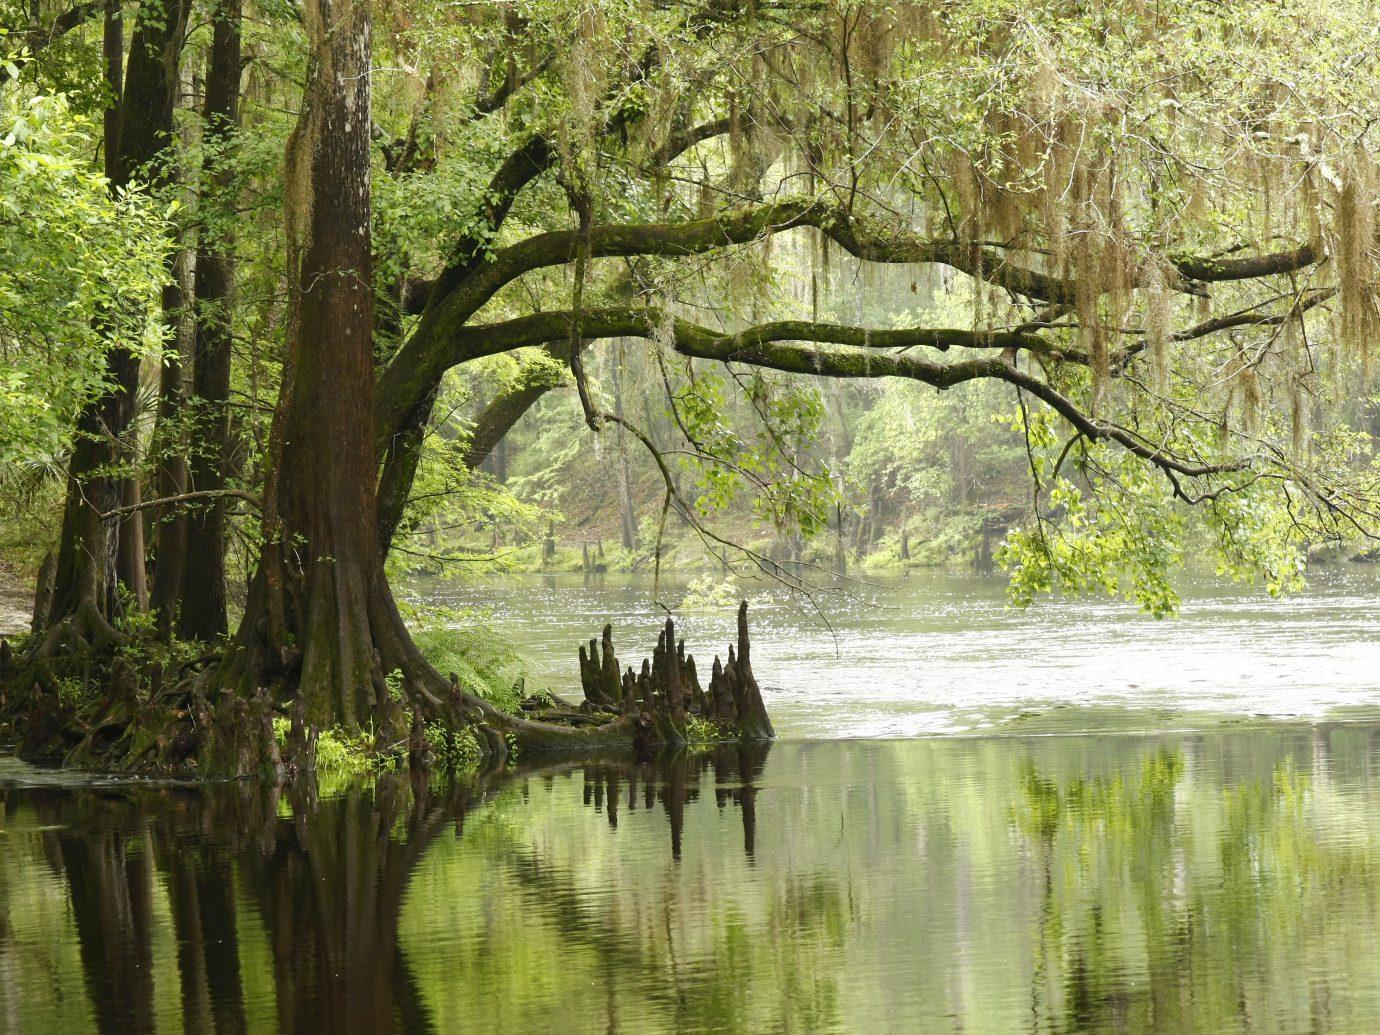 A Large Bald Cypress overhanging the Santa Fe River in Florida